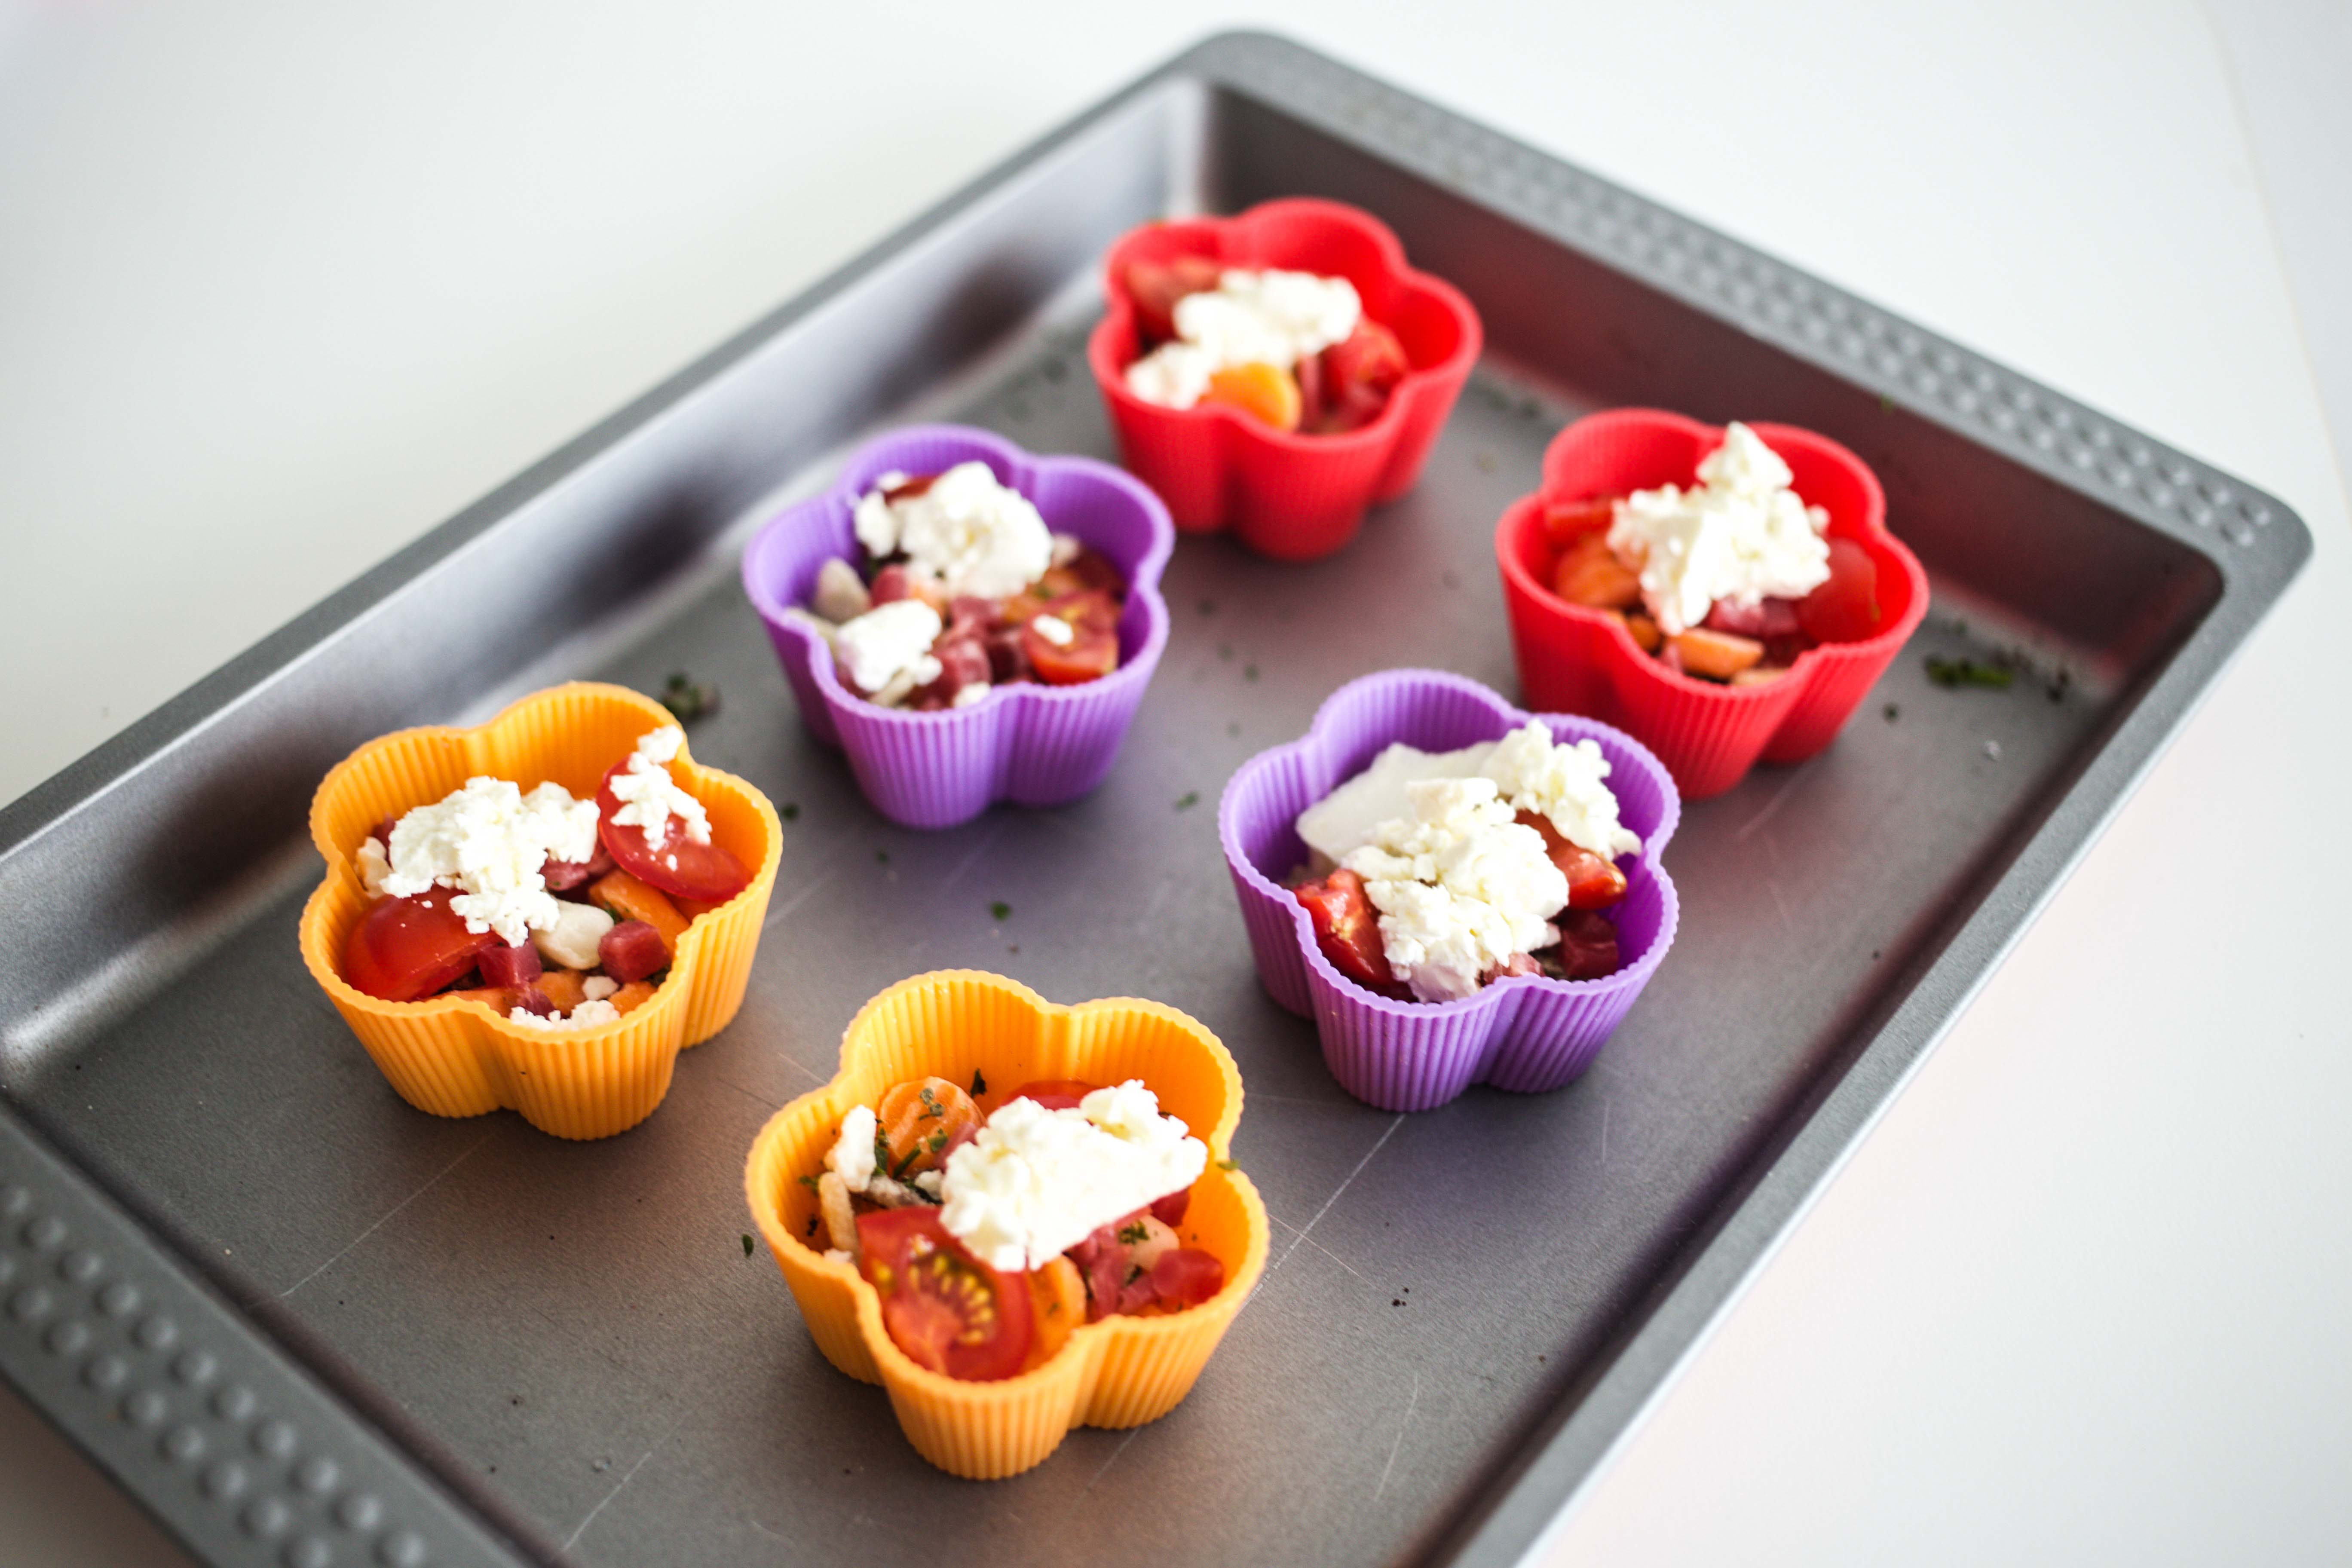 eier-muffins-rezept-gemüse-low-carb-protein-fitness_0549